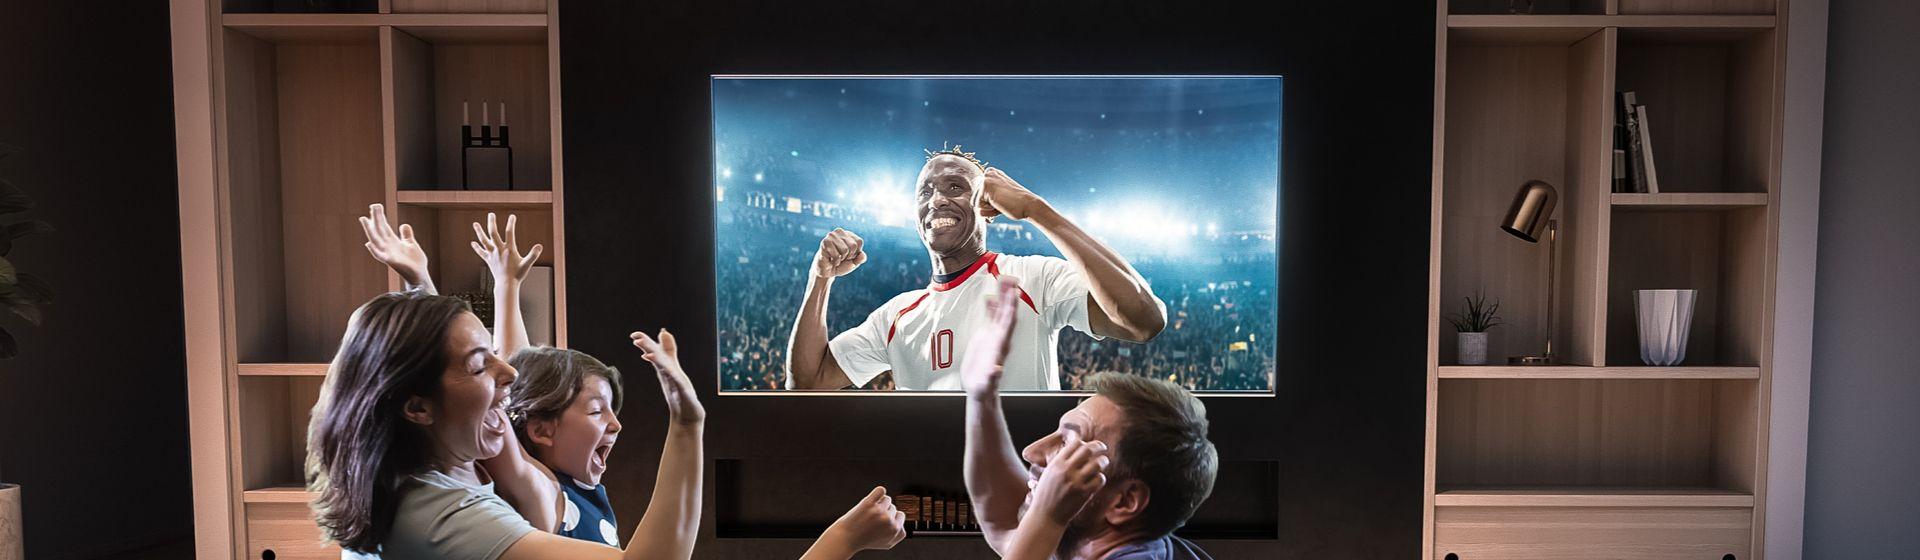 Melhor TV 65 polegadas 2020: LG CX lidera ranking